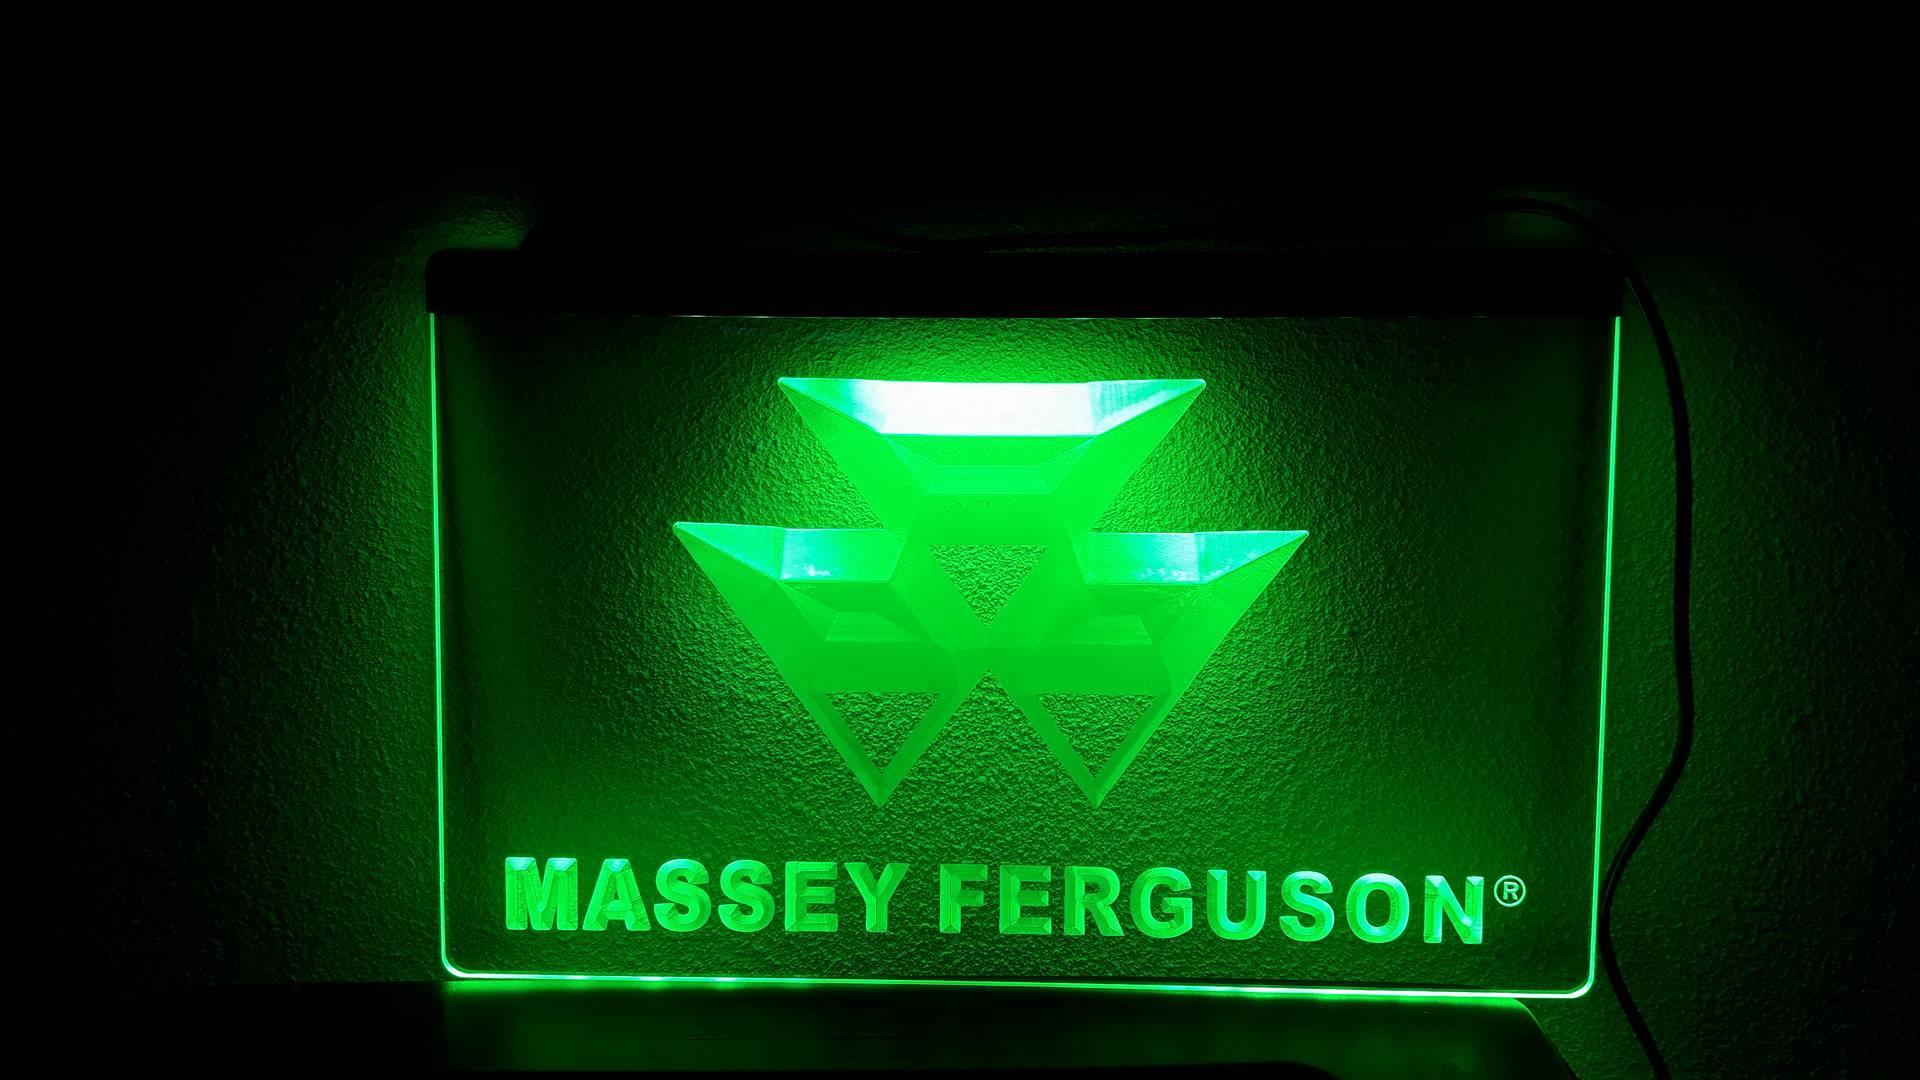 Massey ferguson landbouw machine tractor tekst onder 3d for Tractor verlichting